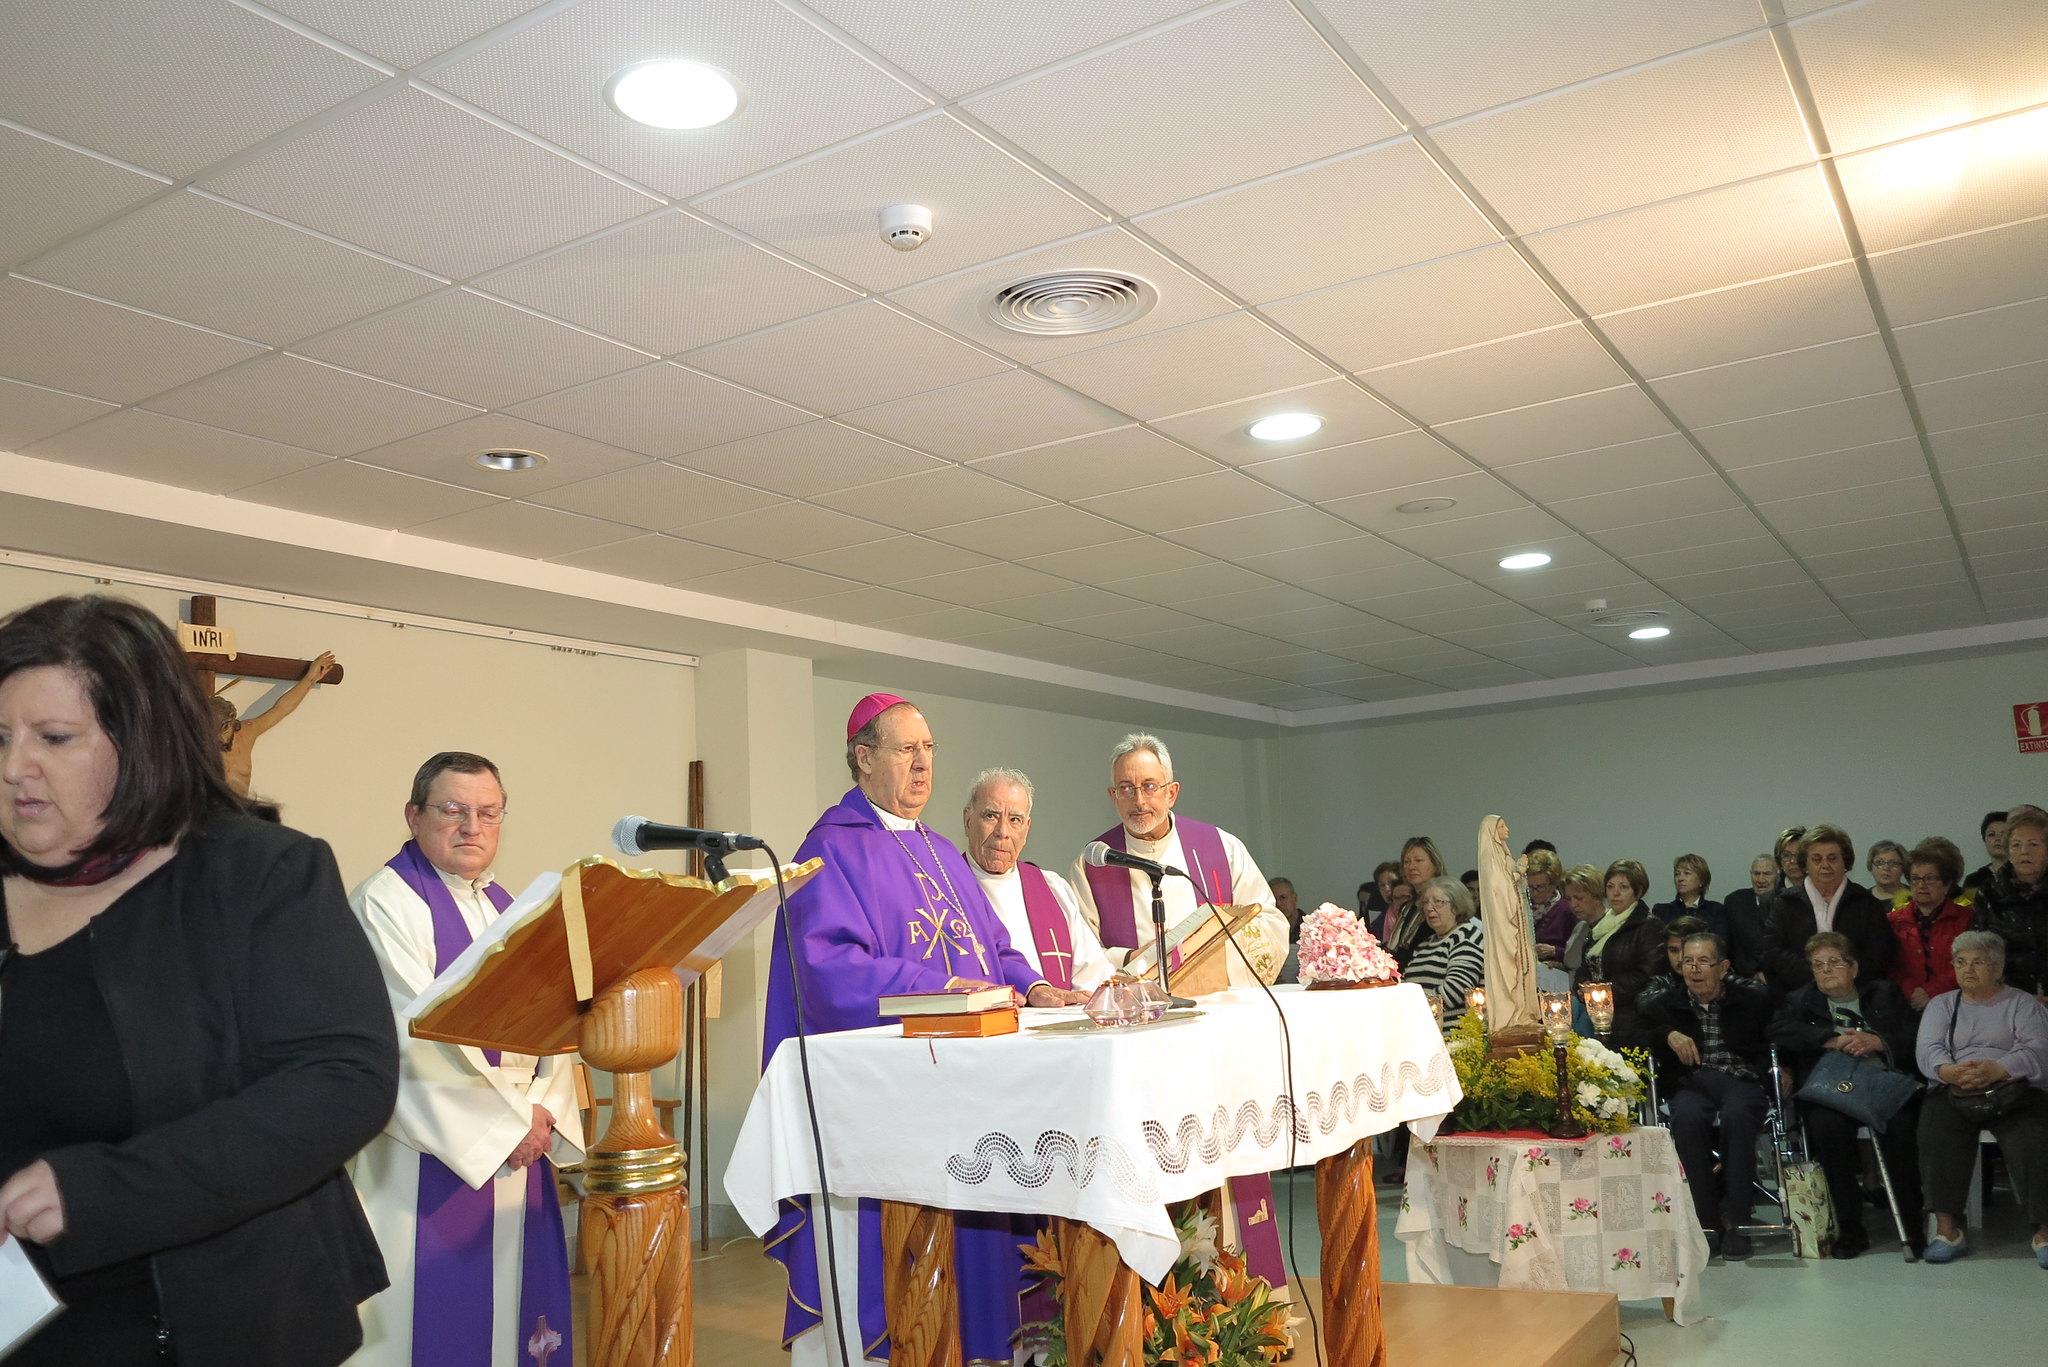 (2016-02-13) - Inauguración Virgen de Lourdes, La Molineta - Archivo La Molineta 2 (03)